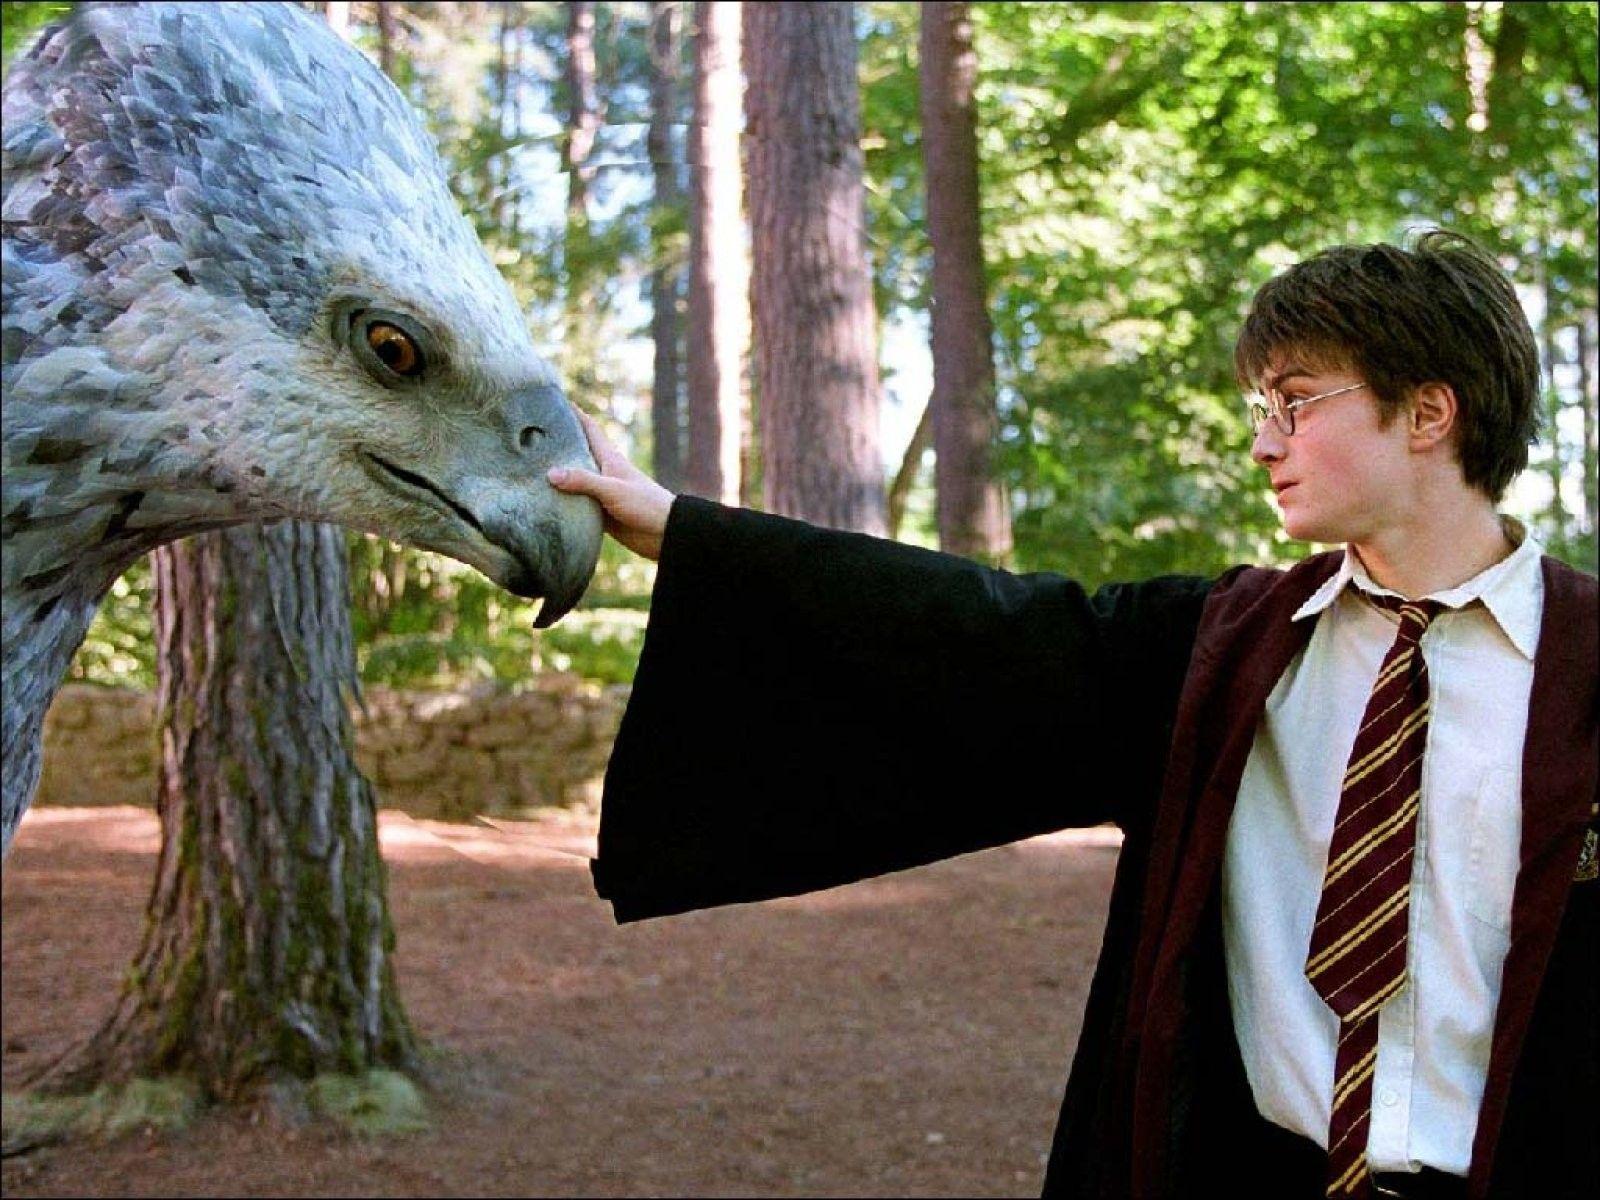 Regresa el universo de Harry Potter al cine